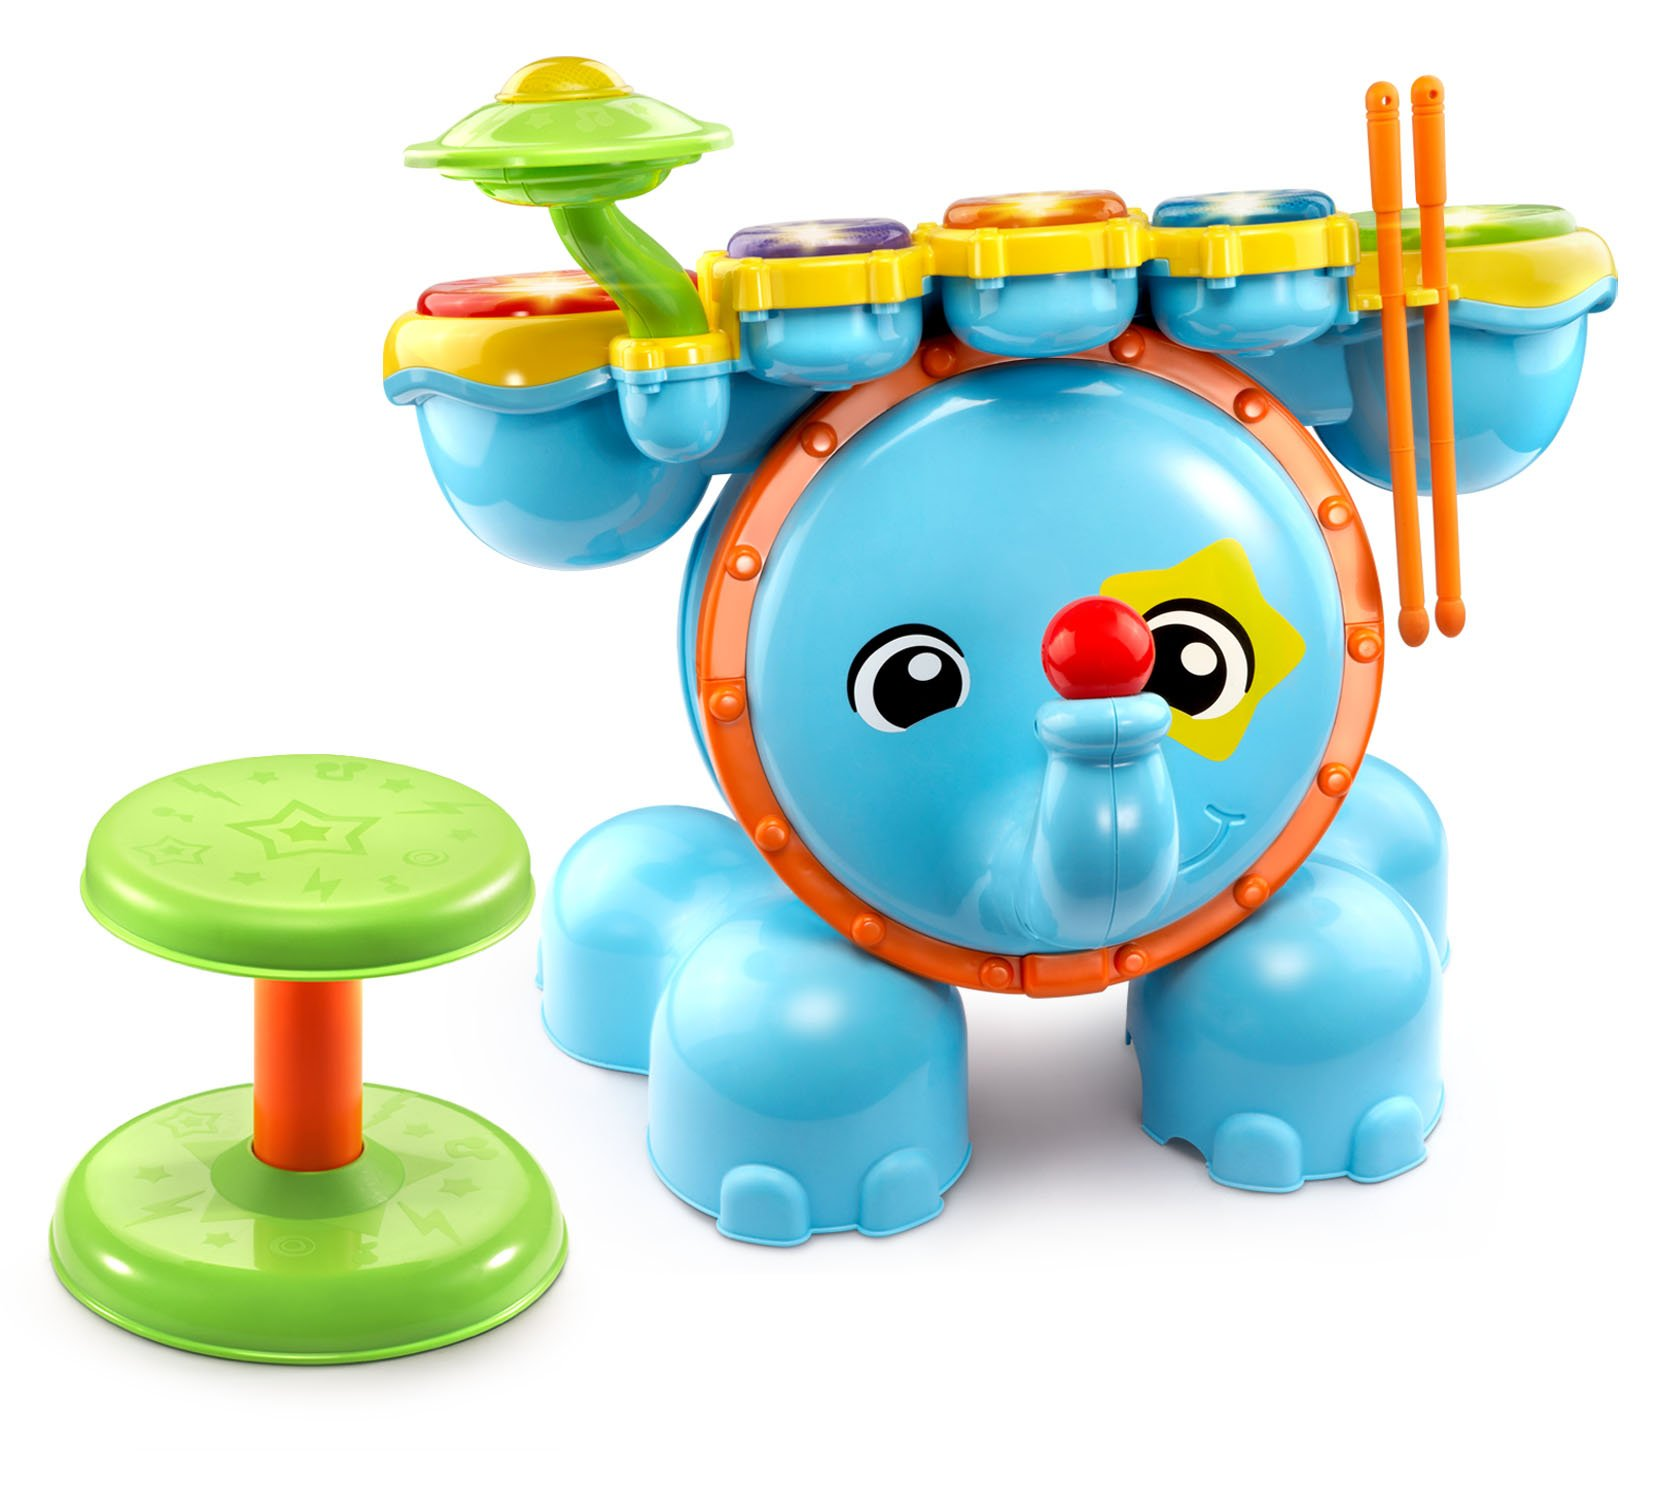 VTech Zoo Jamz Stompin' Fun Drums by VTech